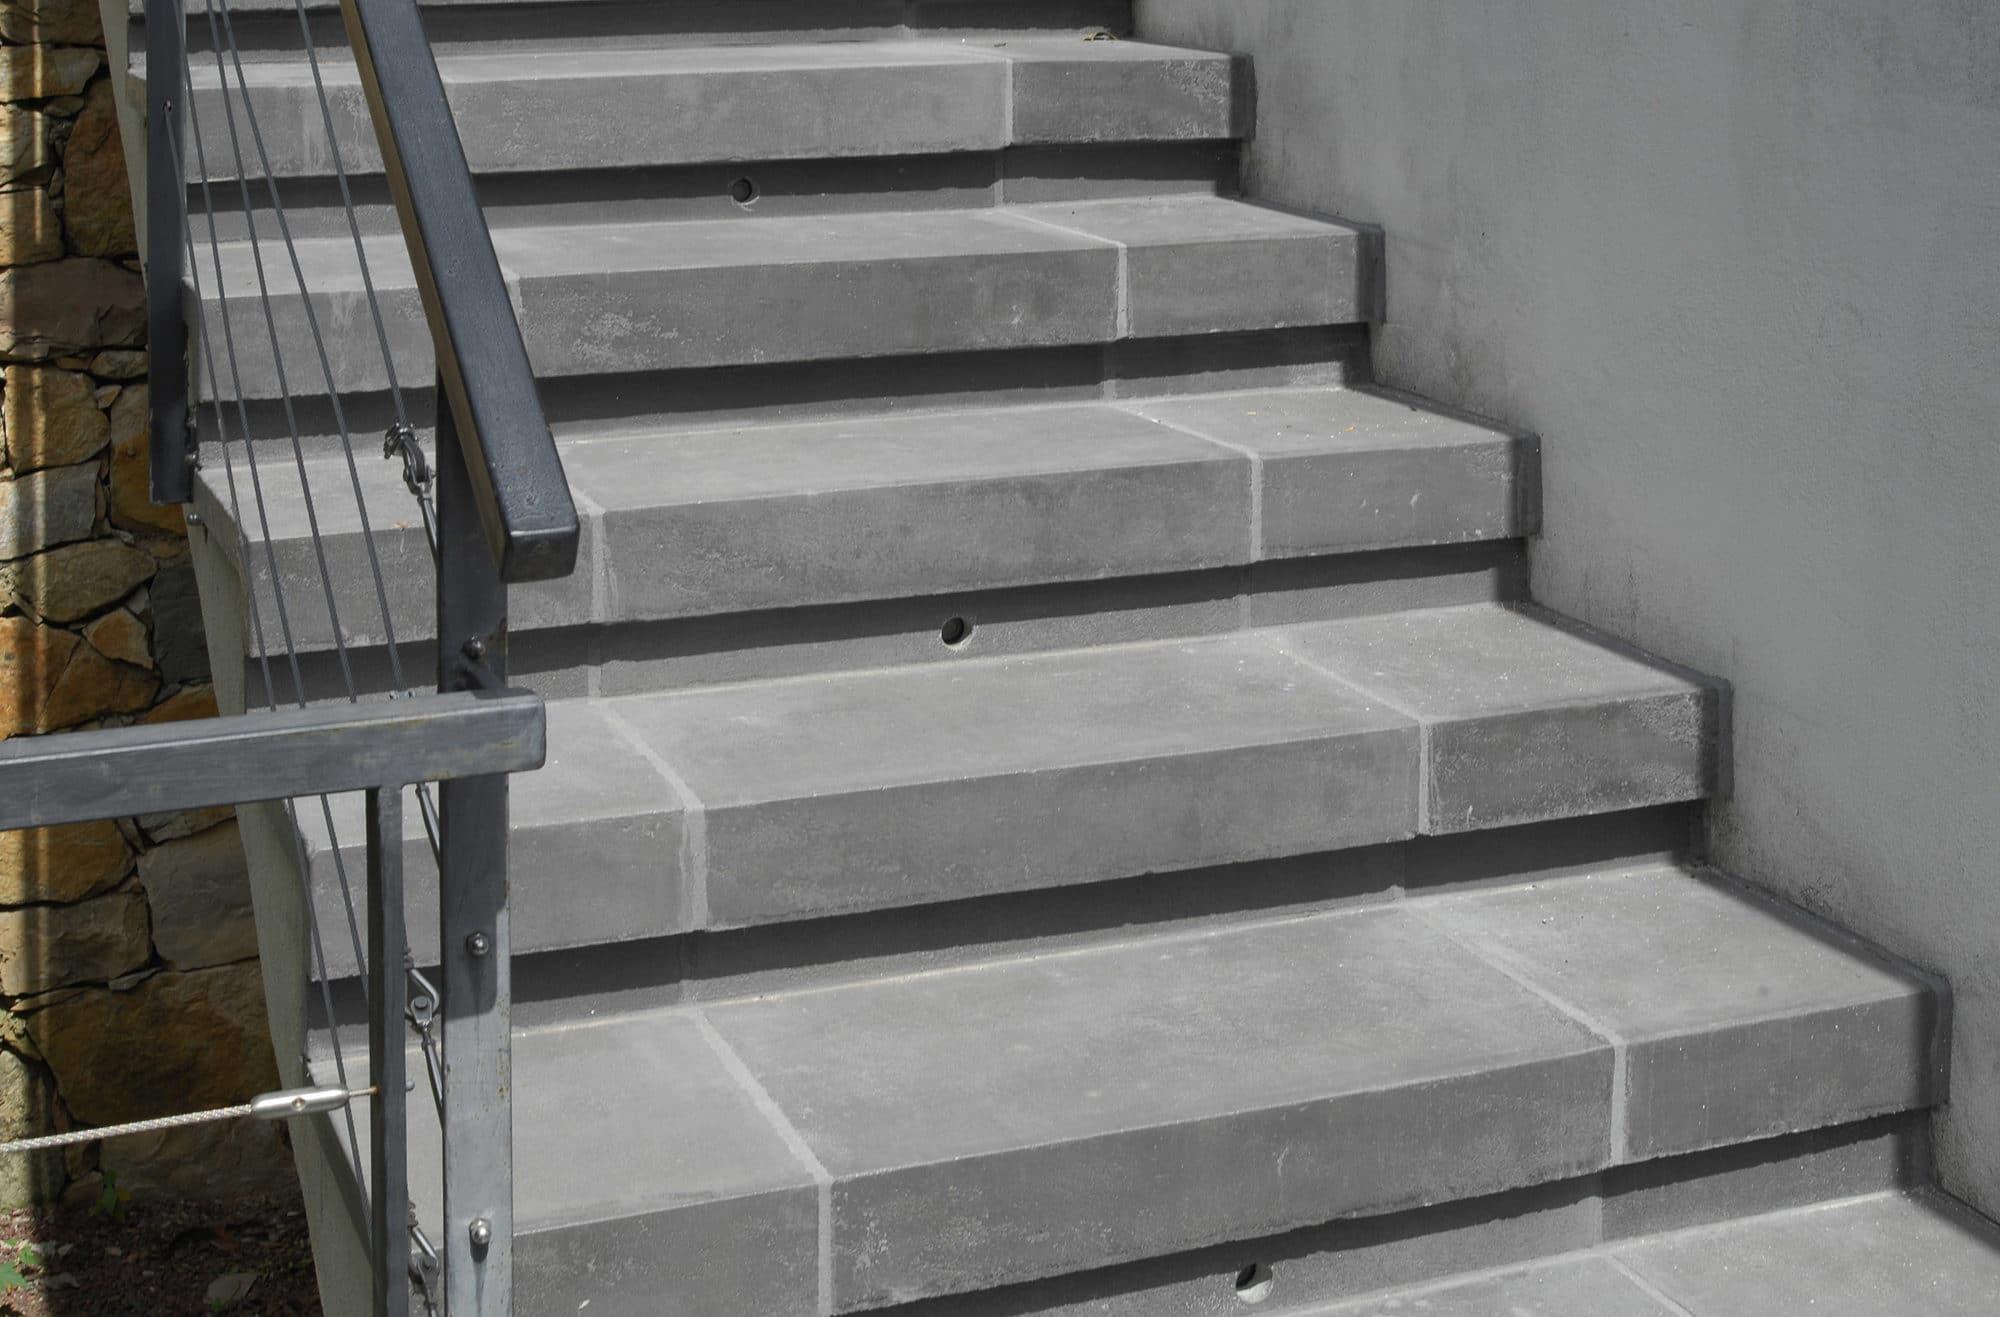 Marche b ton contemporain rouvi re collection - Escalier contemporain beton ...